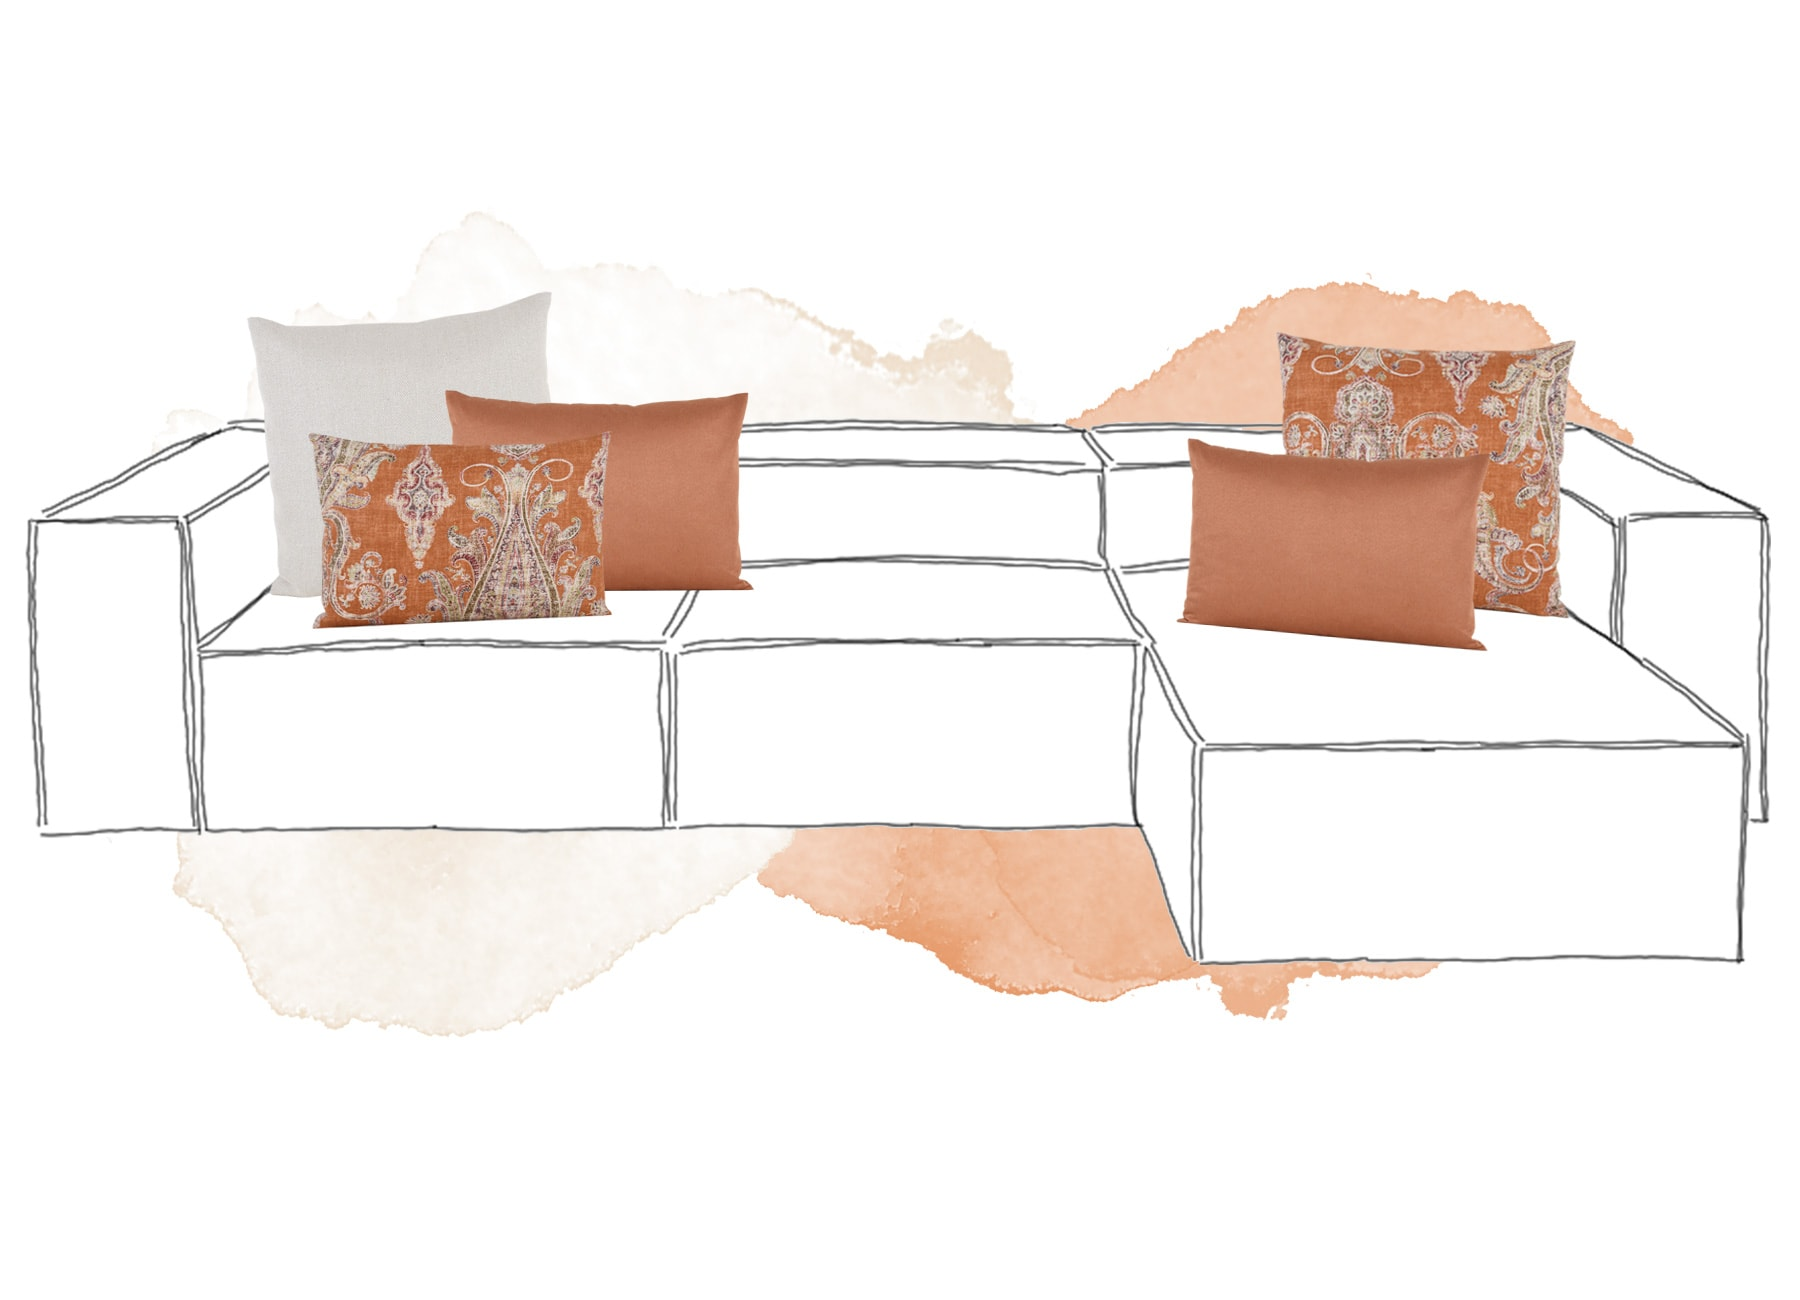 Sofakissen Inspiration in Orange & Beige